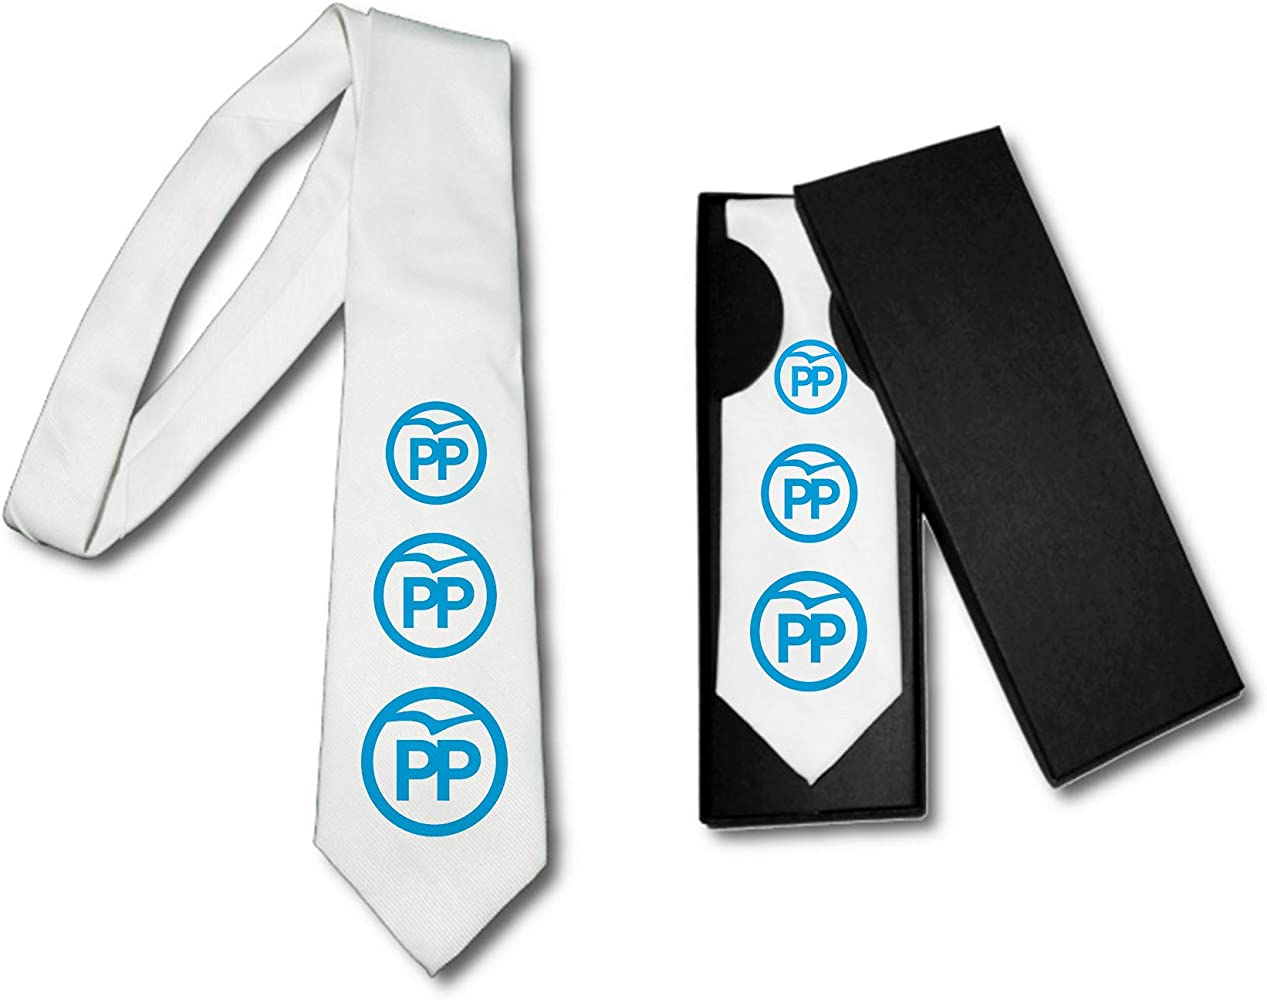 MERCHANDMANIA Corbata Elegante Logo Partido Popular Suave ...